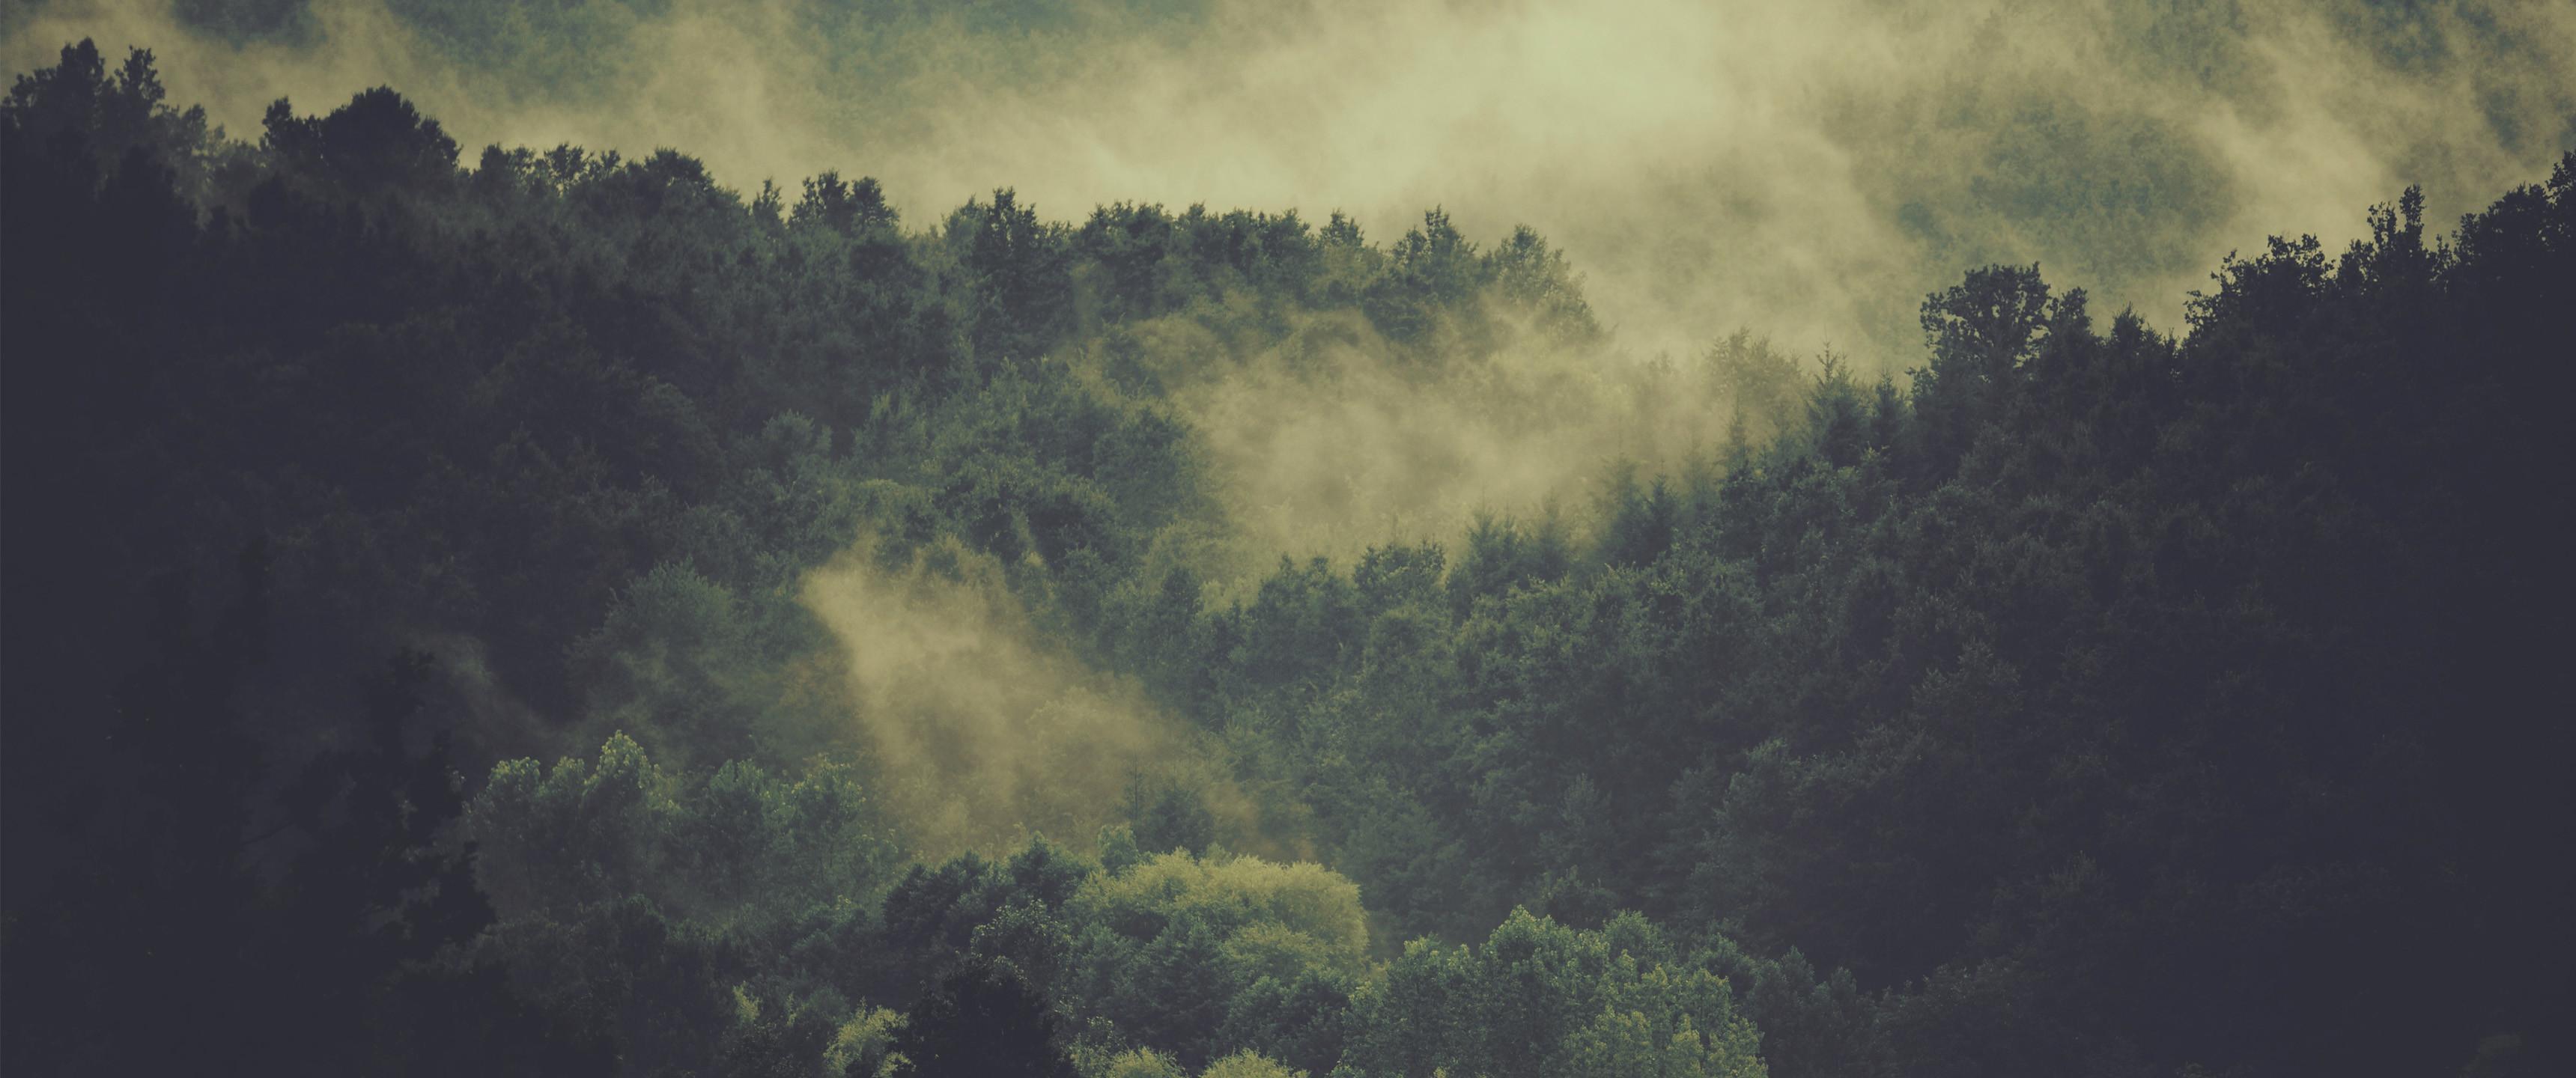 Hovering Fog – 21:9 Ultrawide HD Wallpaper (3440×1440)